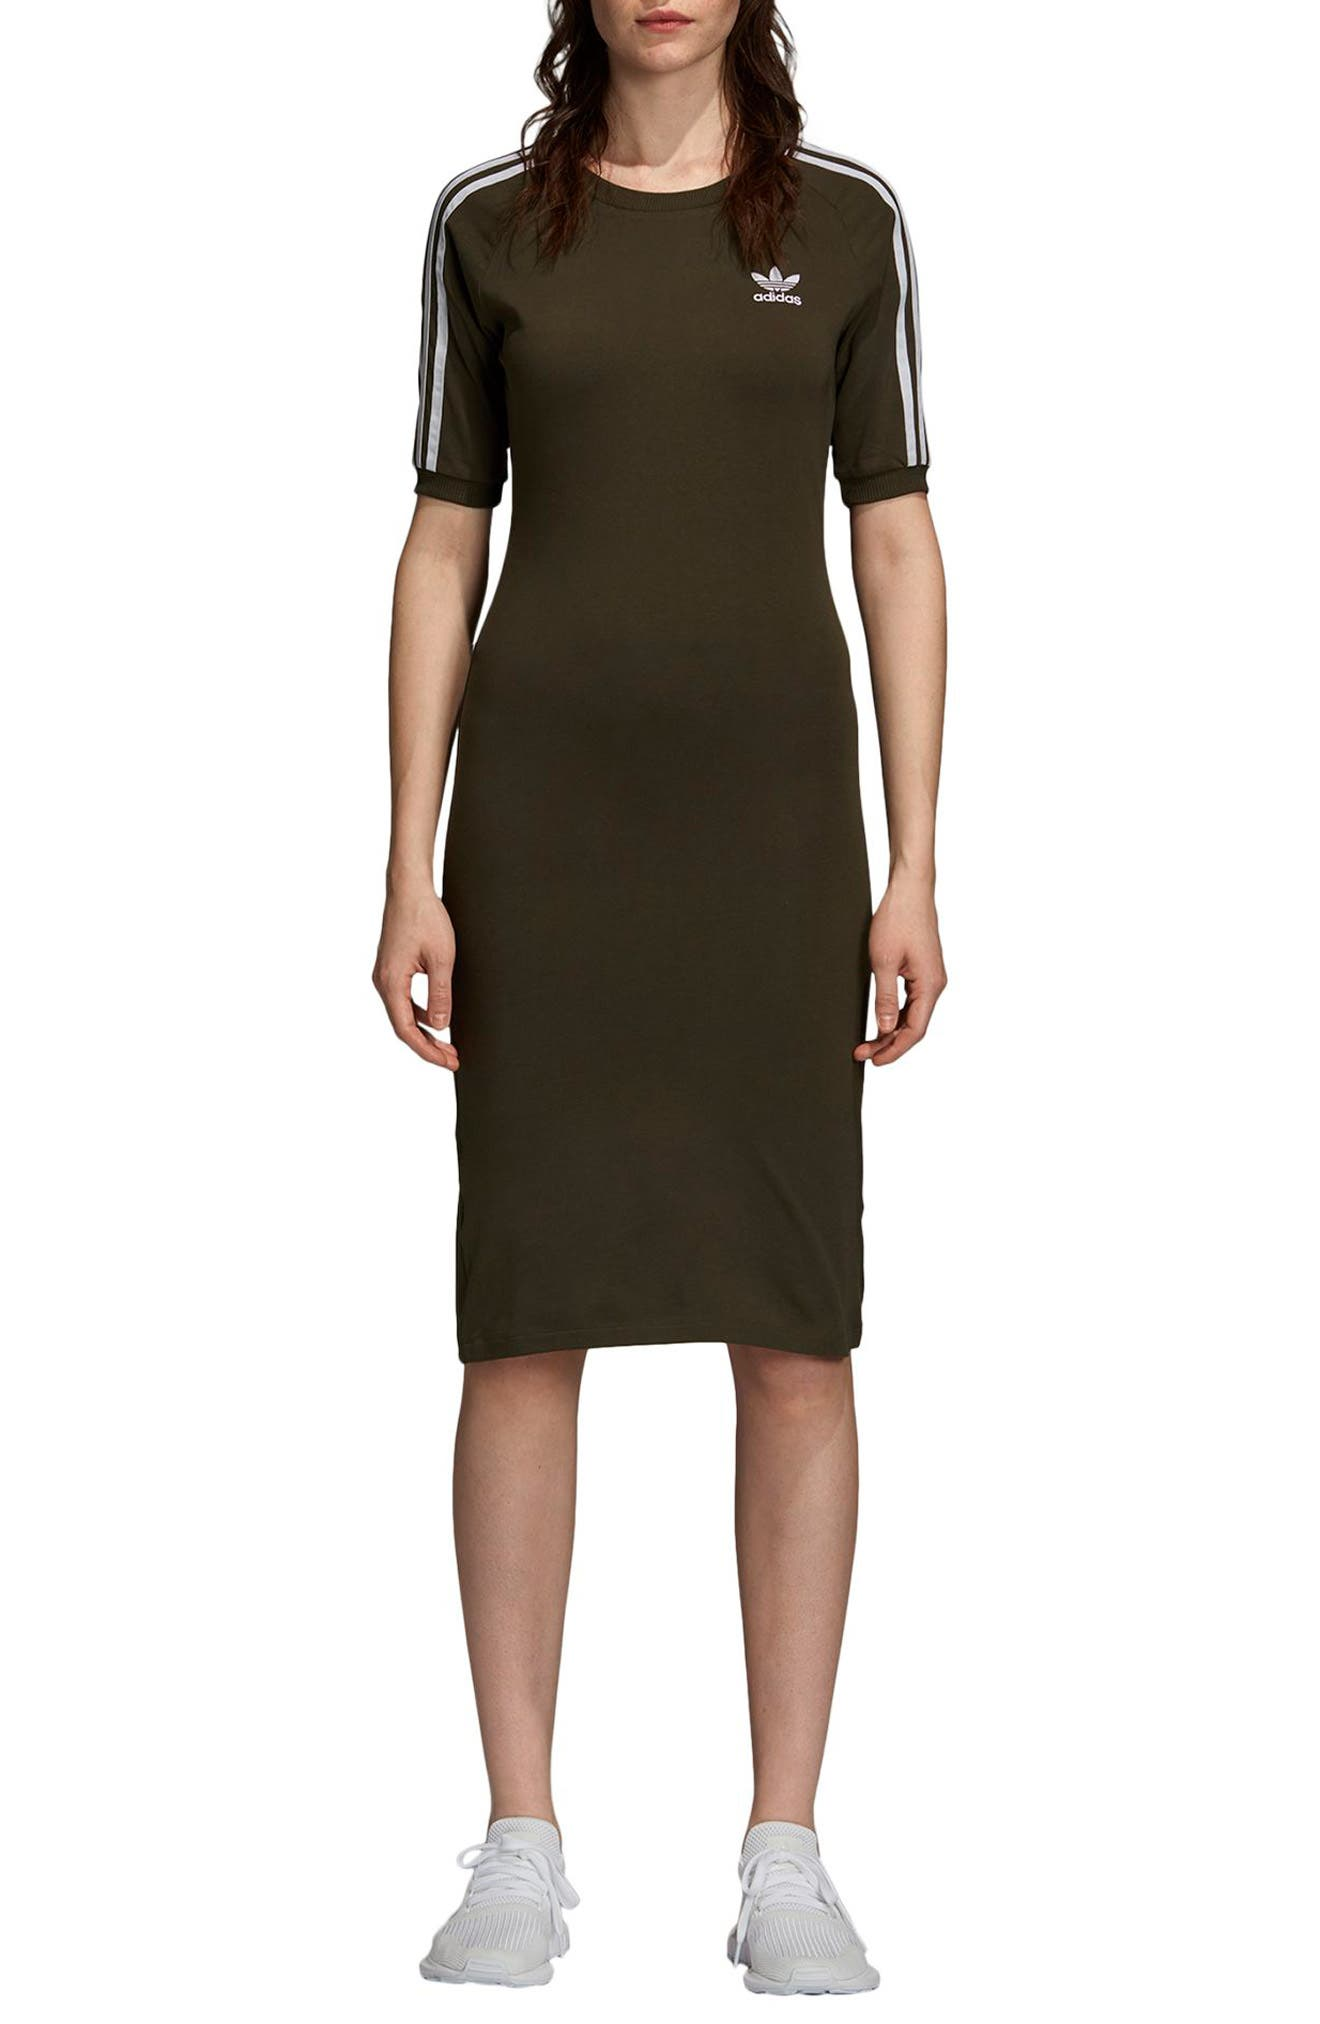 adidas 3-Stripes Dress,                             Main thumbnail 1, color,                             NIGHT CARGO